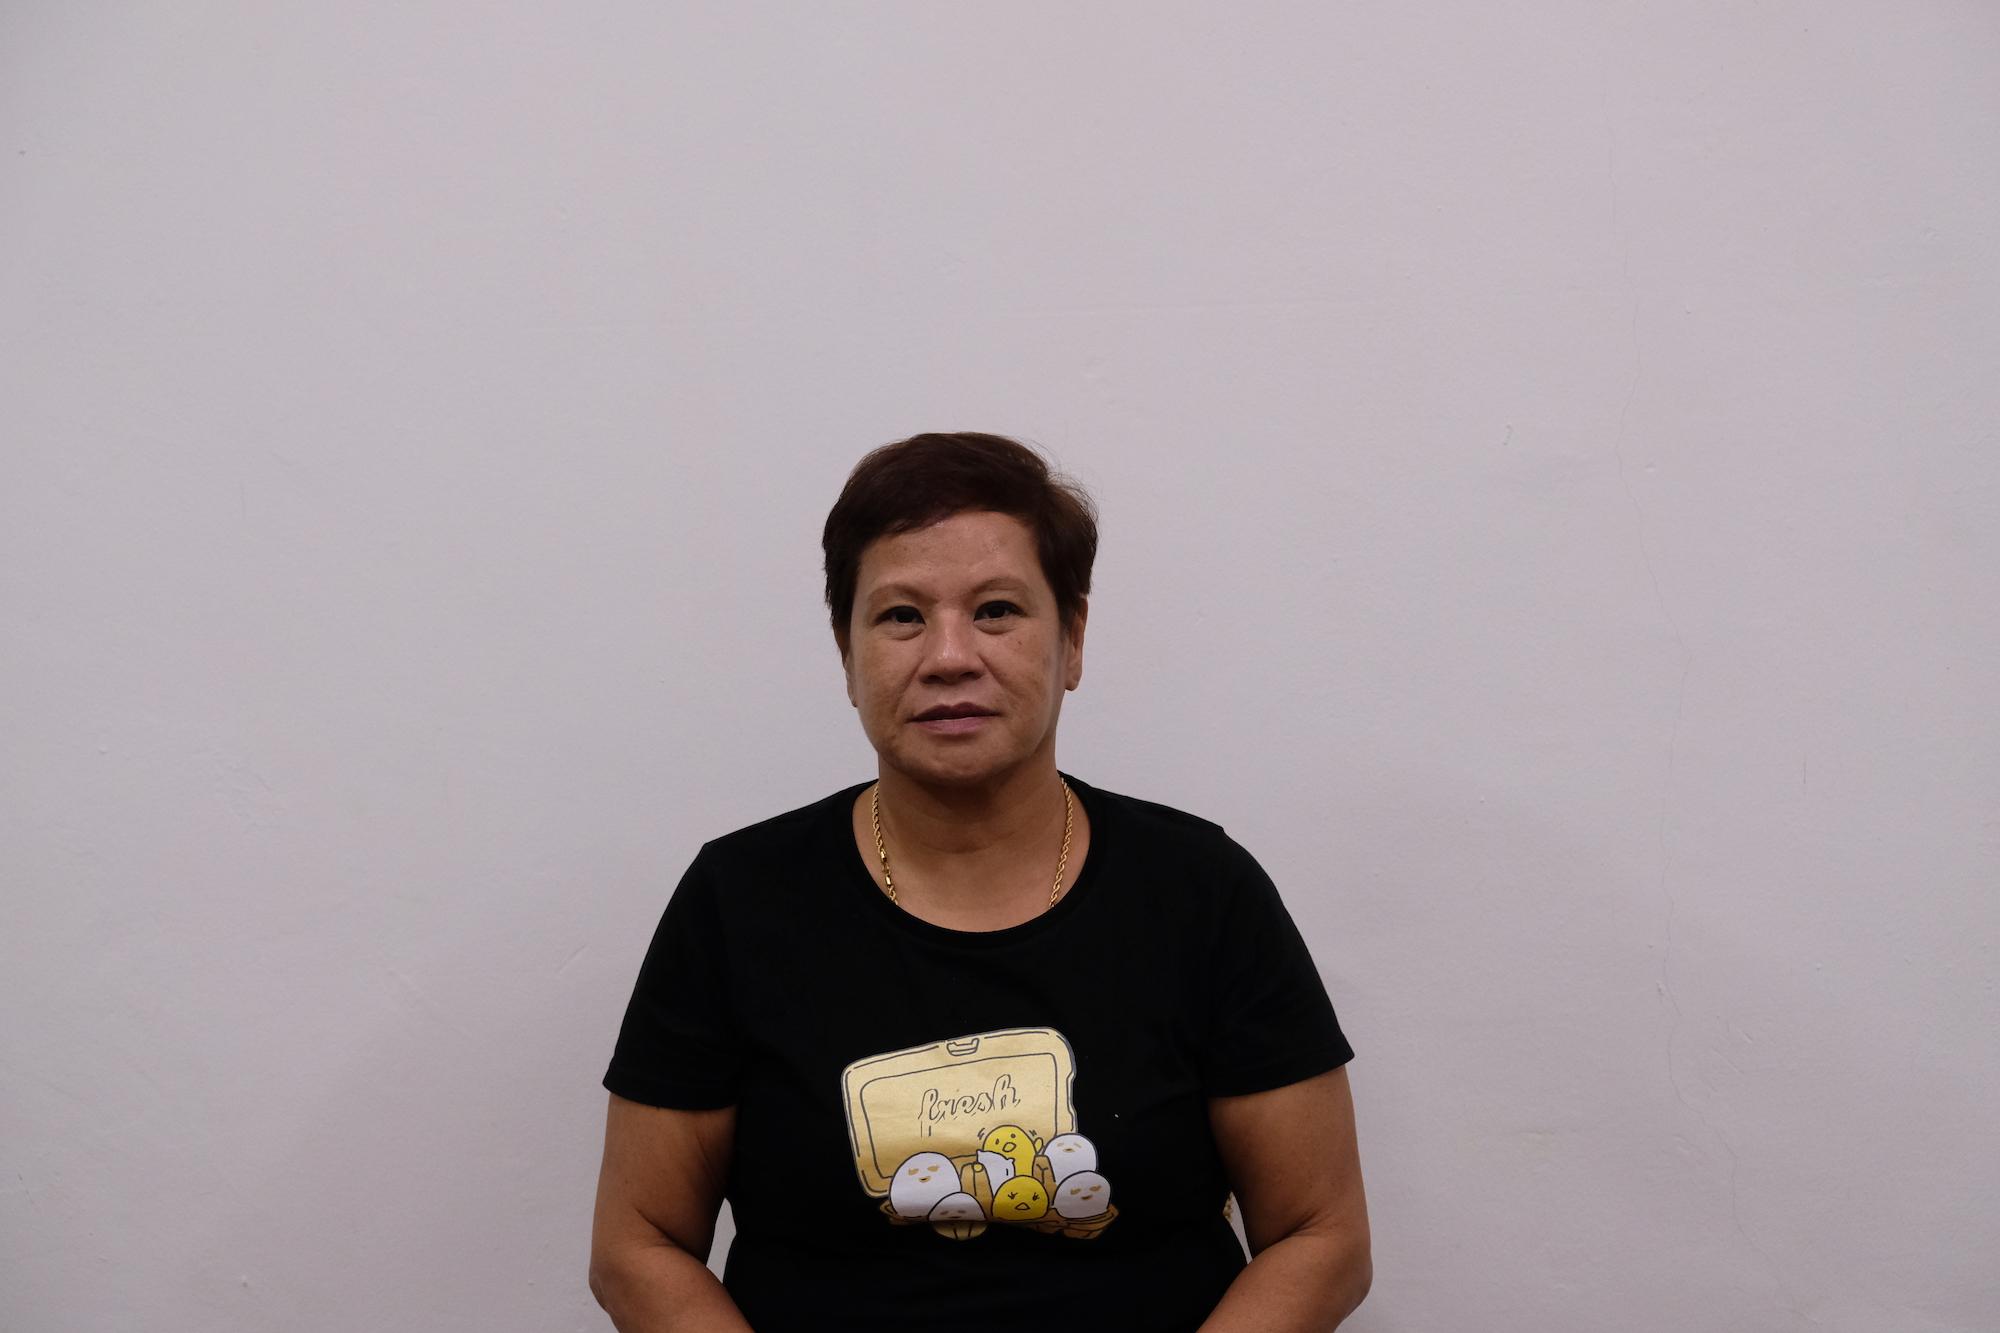 Salimah Binte Sukar